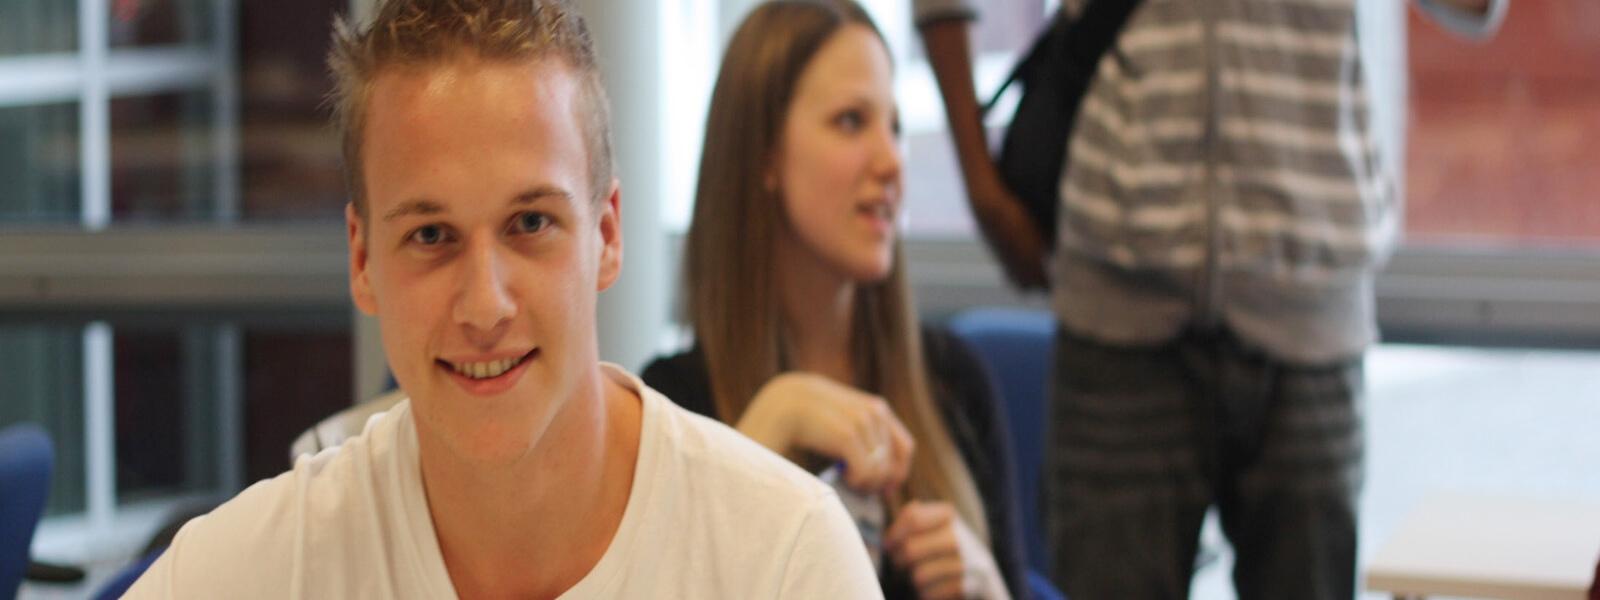 studyinholland-universitiesofappliedsciences-bachelor- information management- wittenborg-apeldoorn- holland